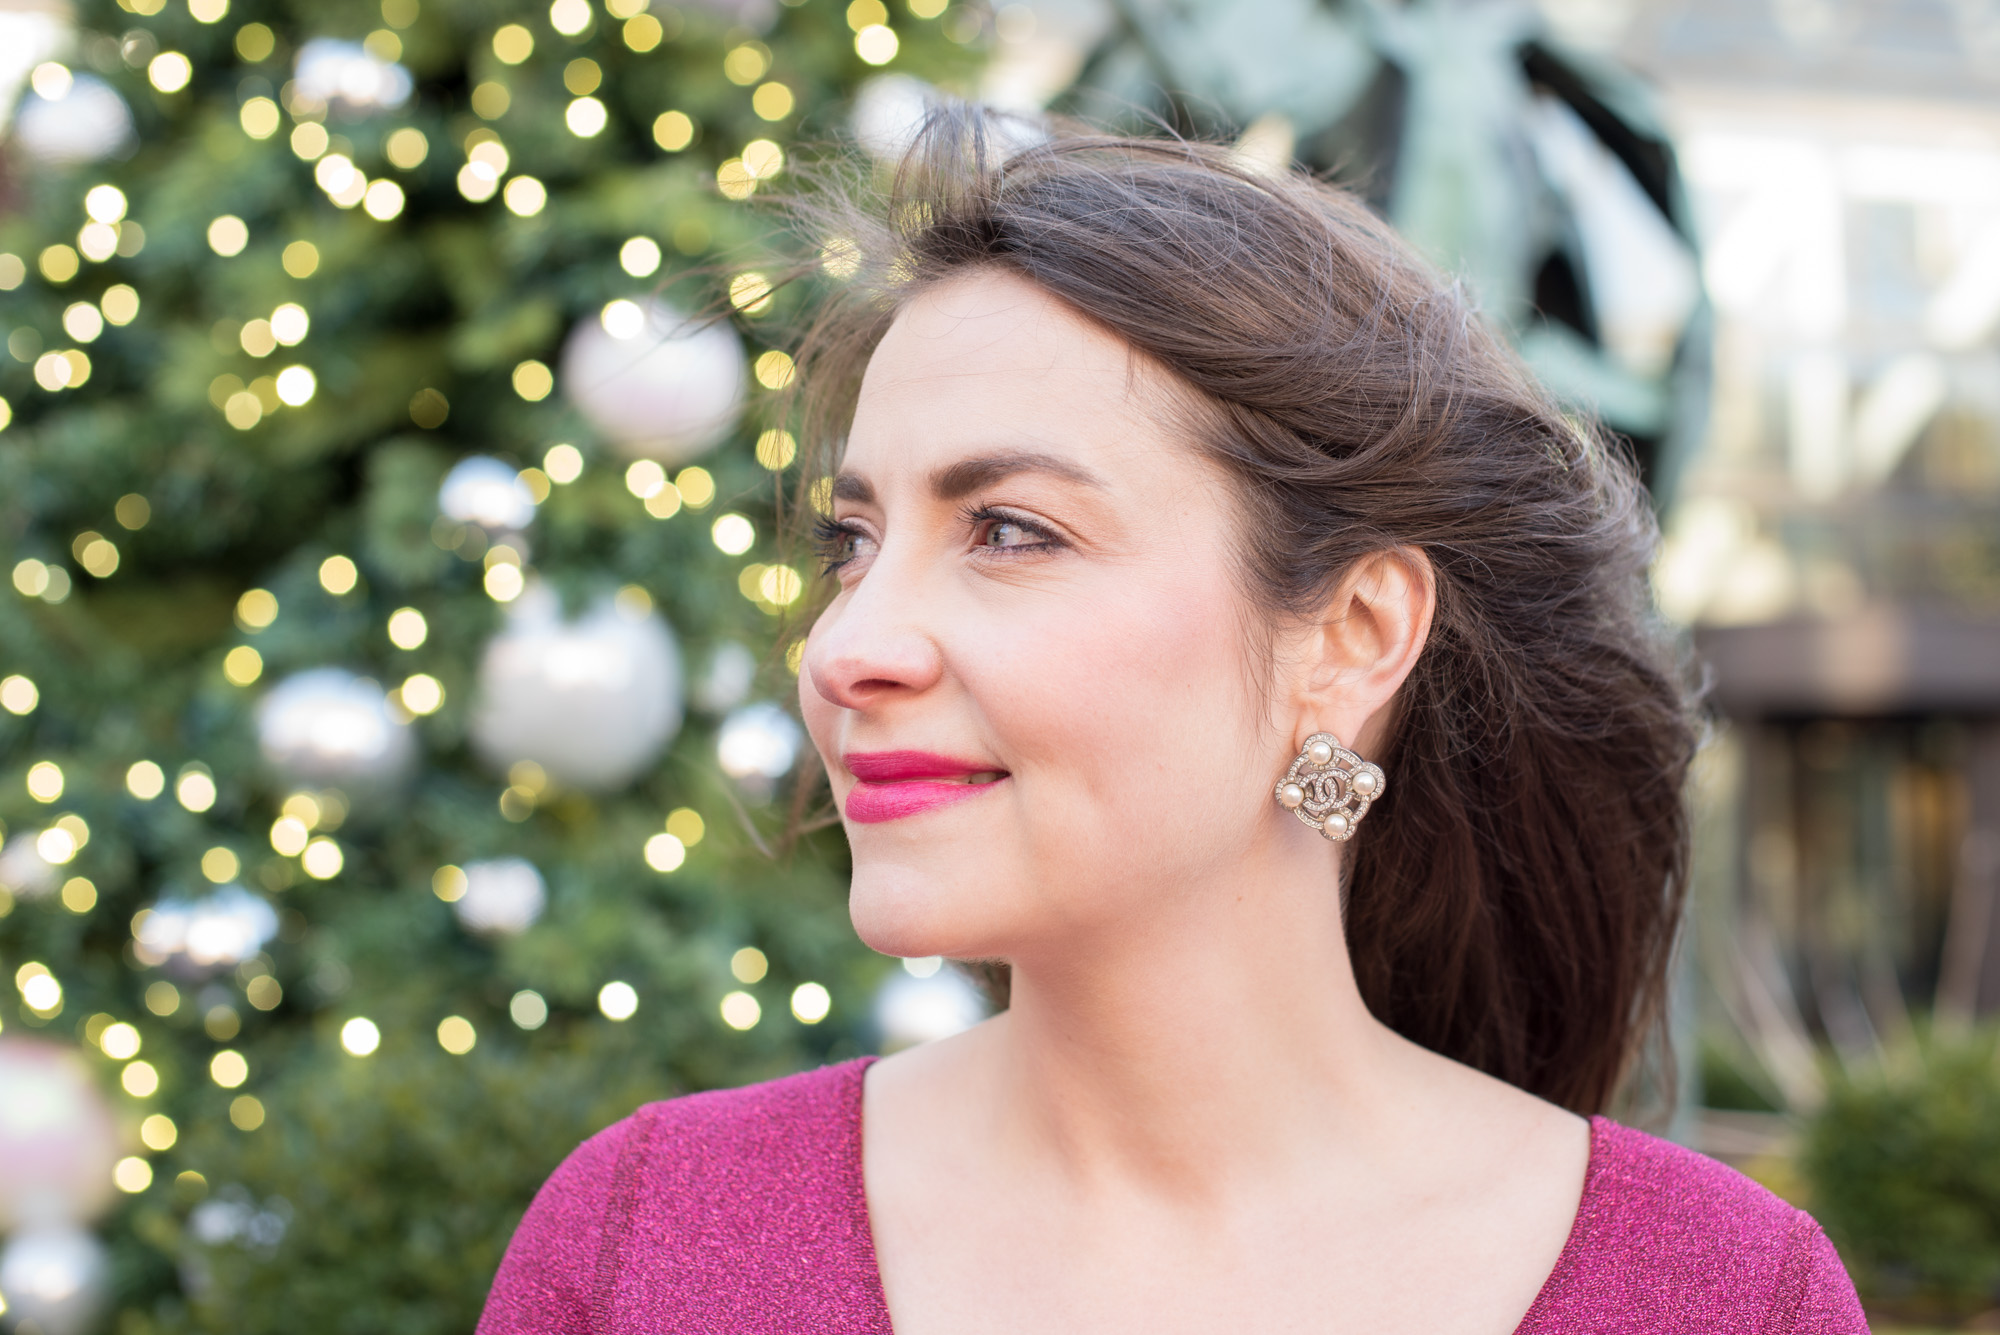 chanel rhinestone earrings, the-alyst.com